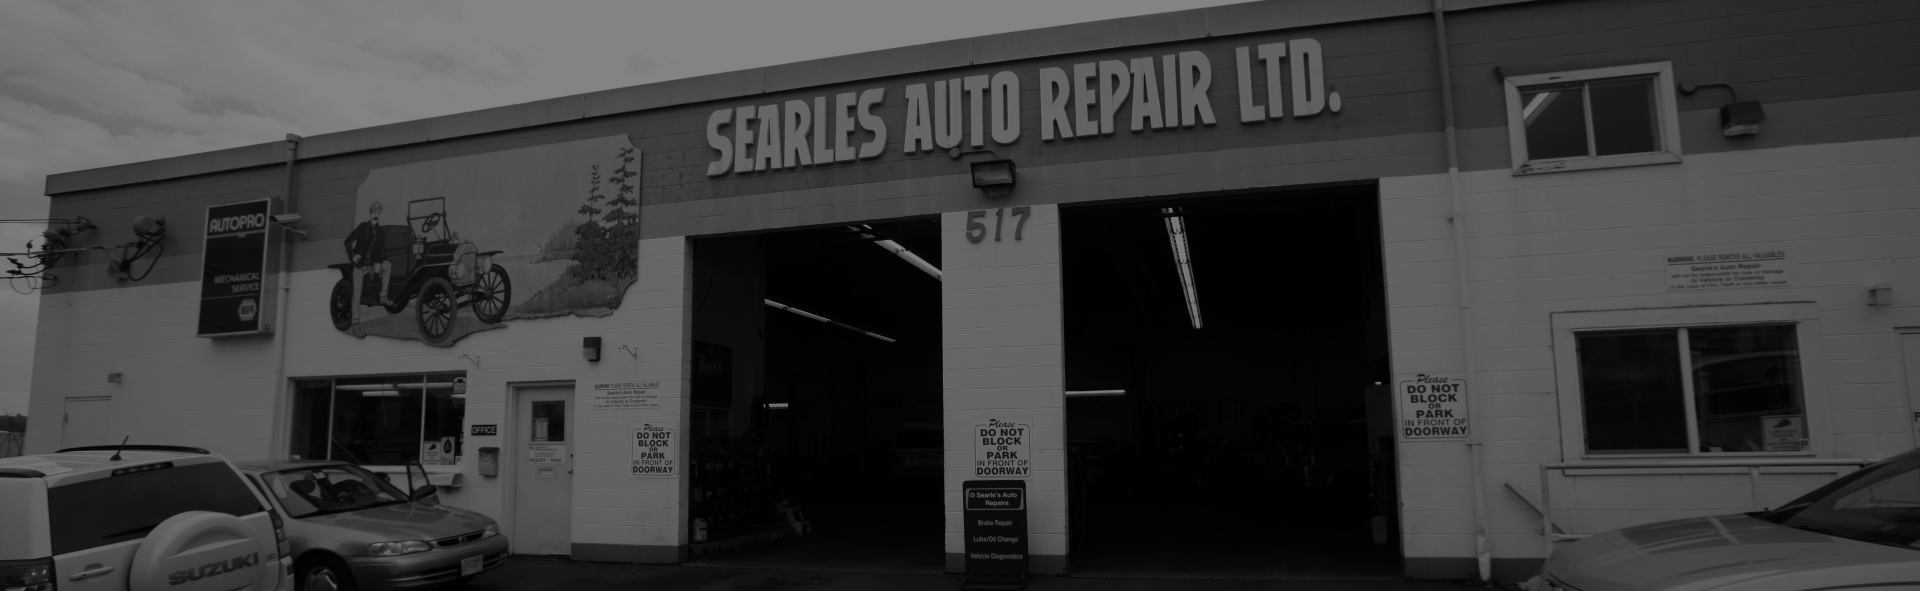 Searles Auto Repair Outside SLider